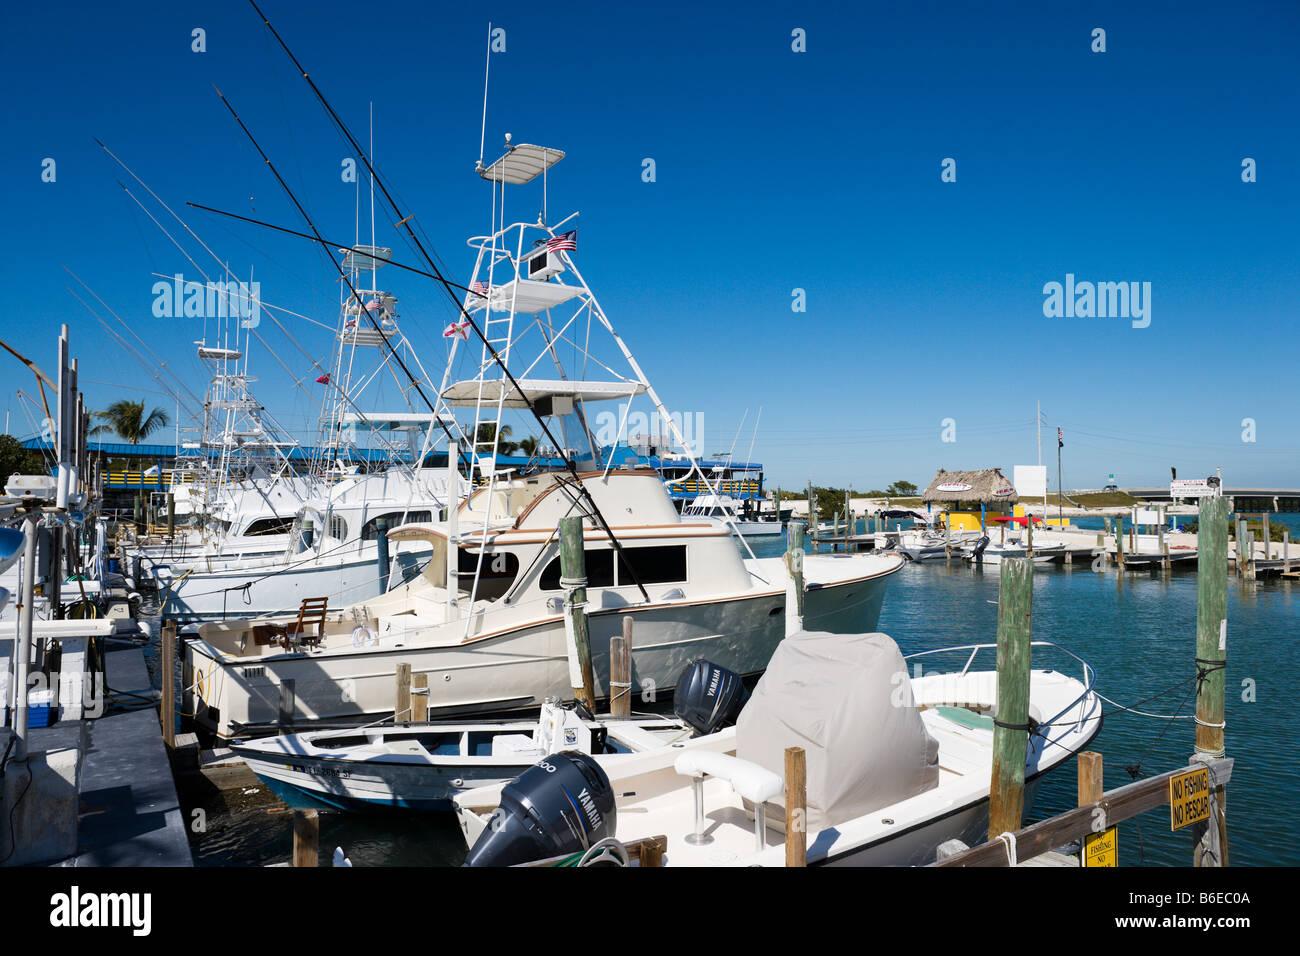 Fishing boats for charter at Whale Harbour, Upper Matecumbe Key, Islamorada, Florida Keys, USA - Stock Image